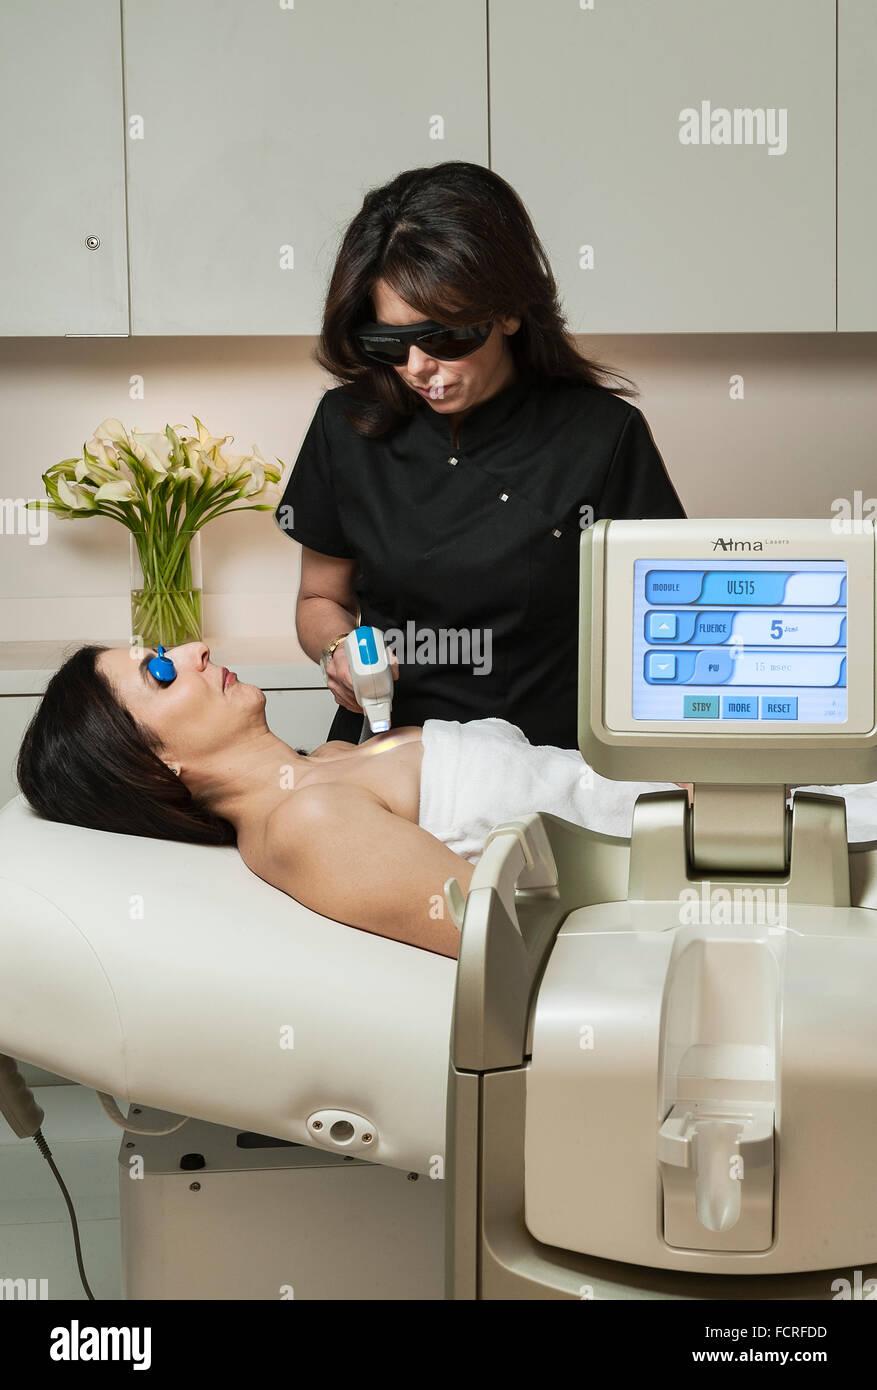 IPL, Intense Pulsed Laser Treatment for damaged skin. - Stock Image